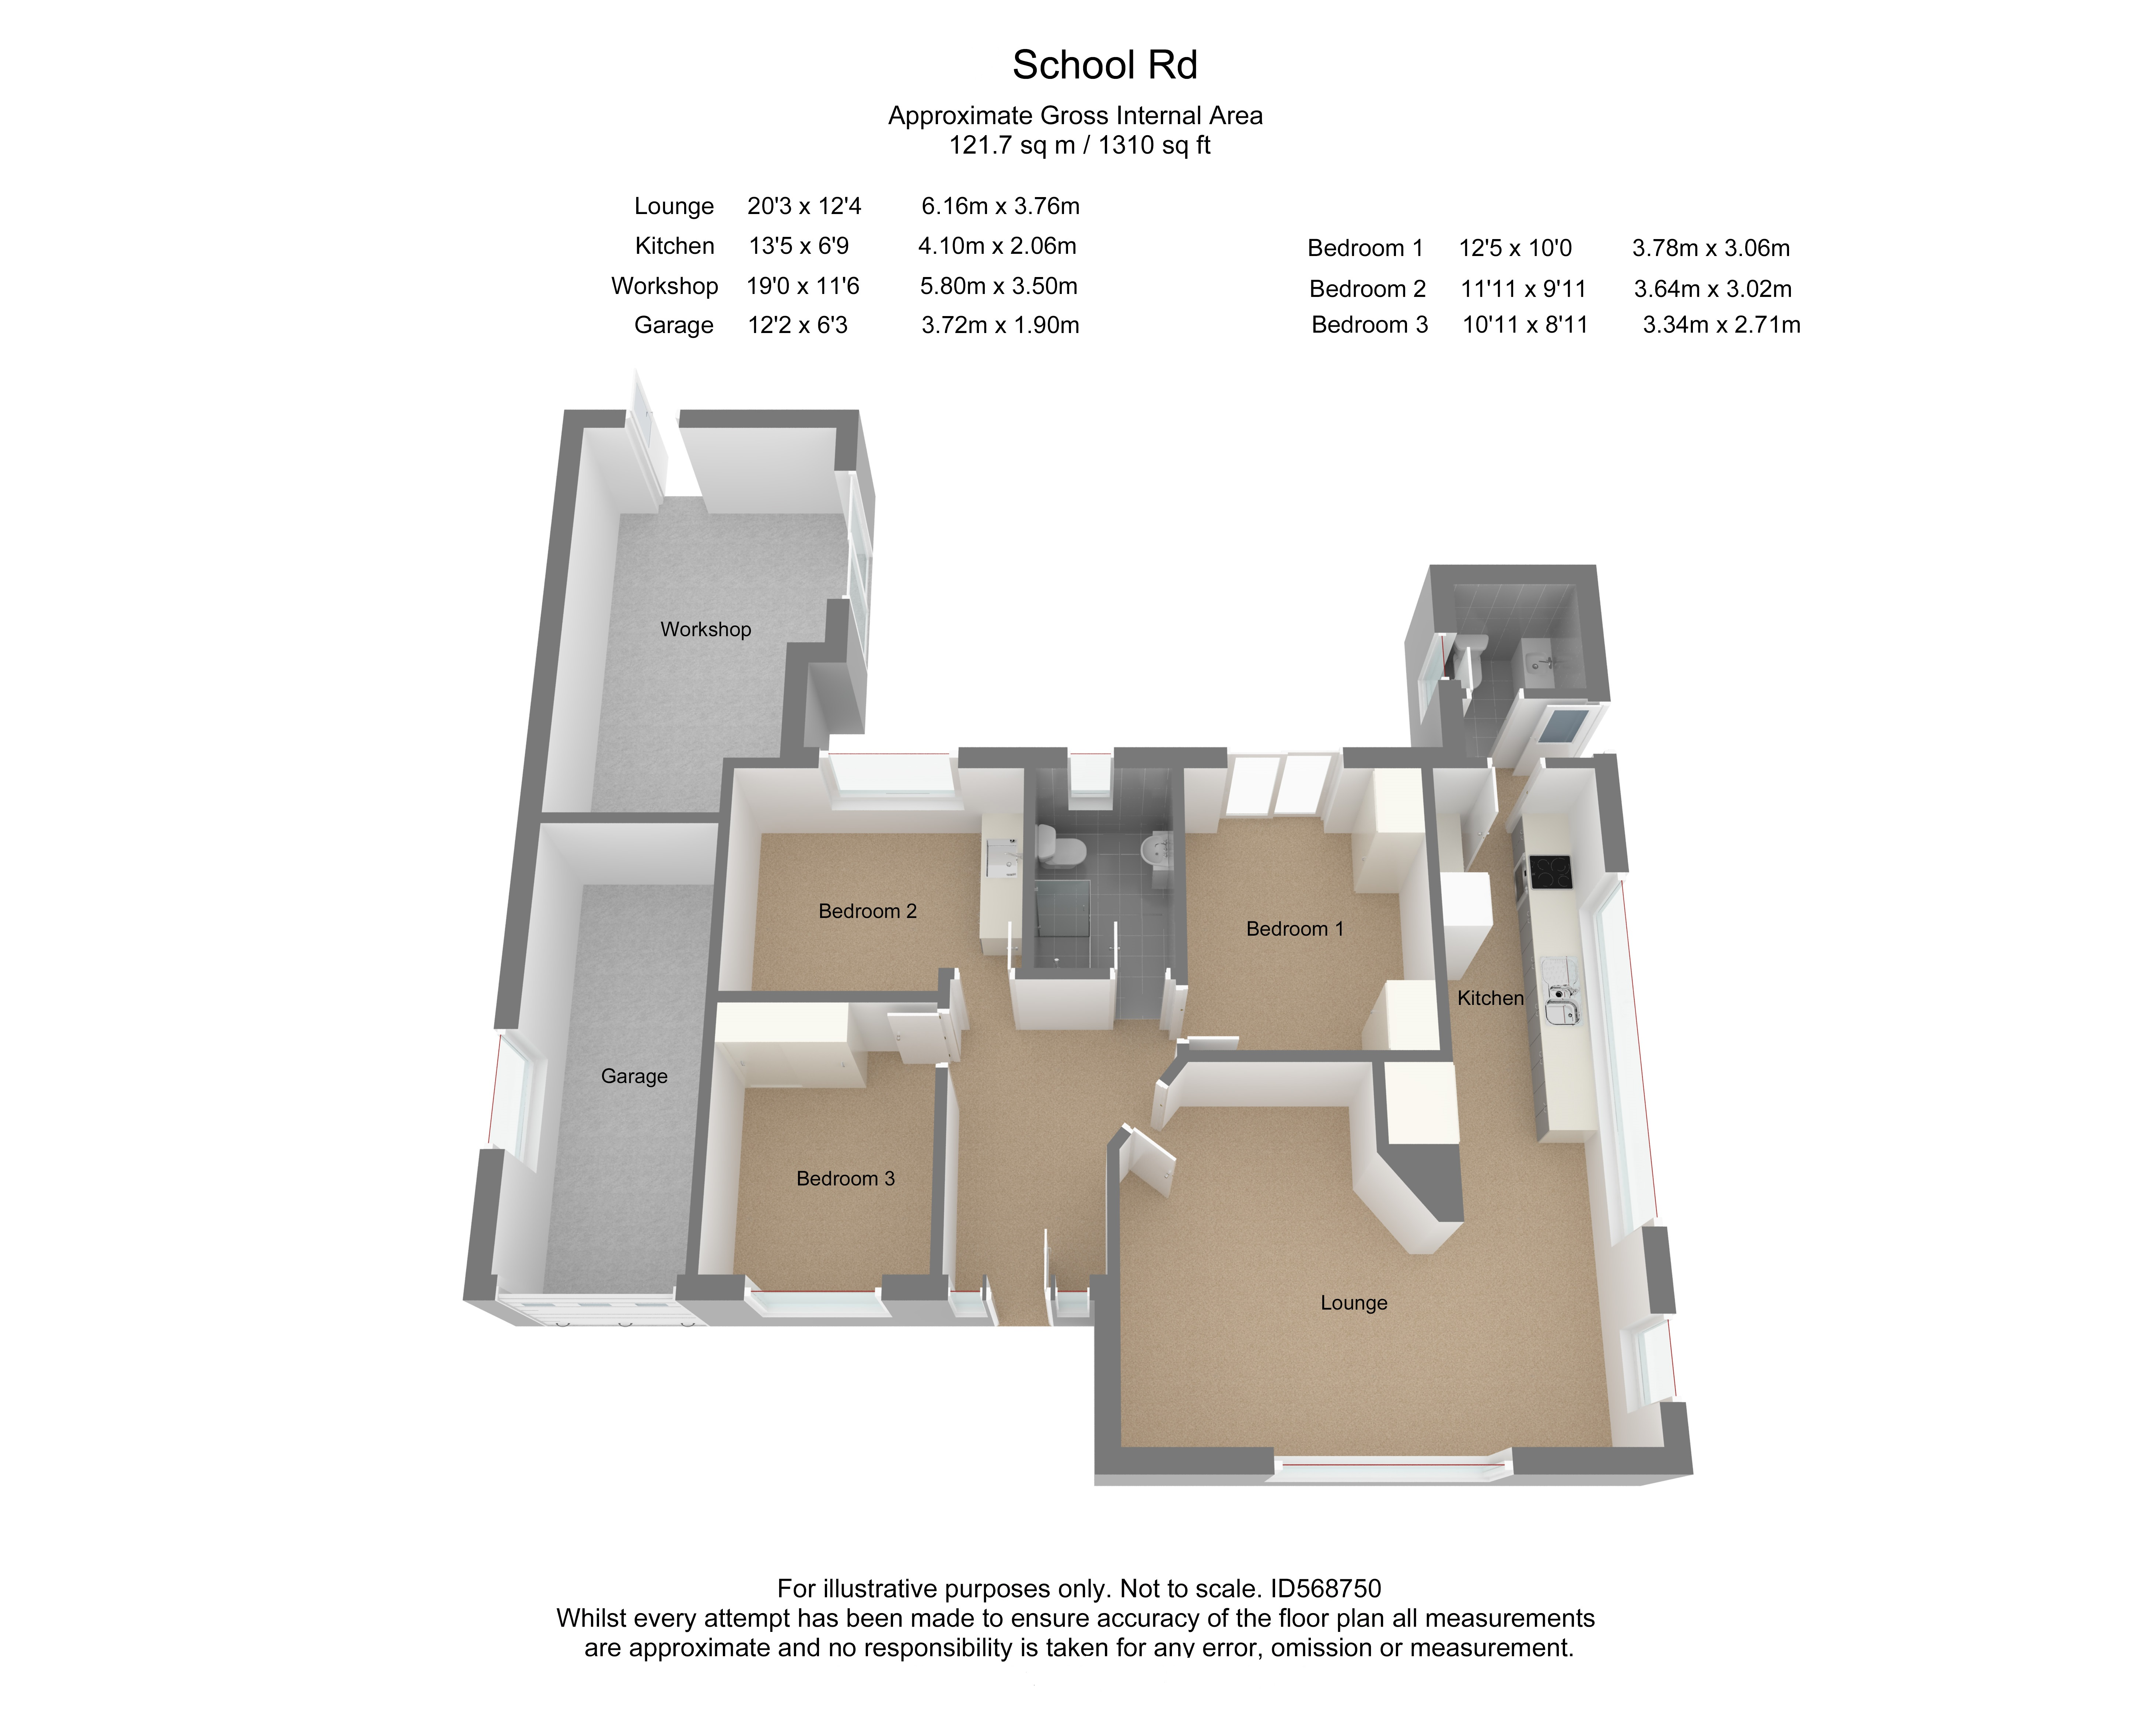 Floorplan for School Road, Frampton Cotterell.